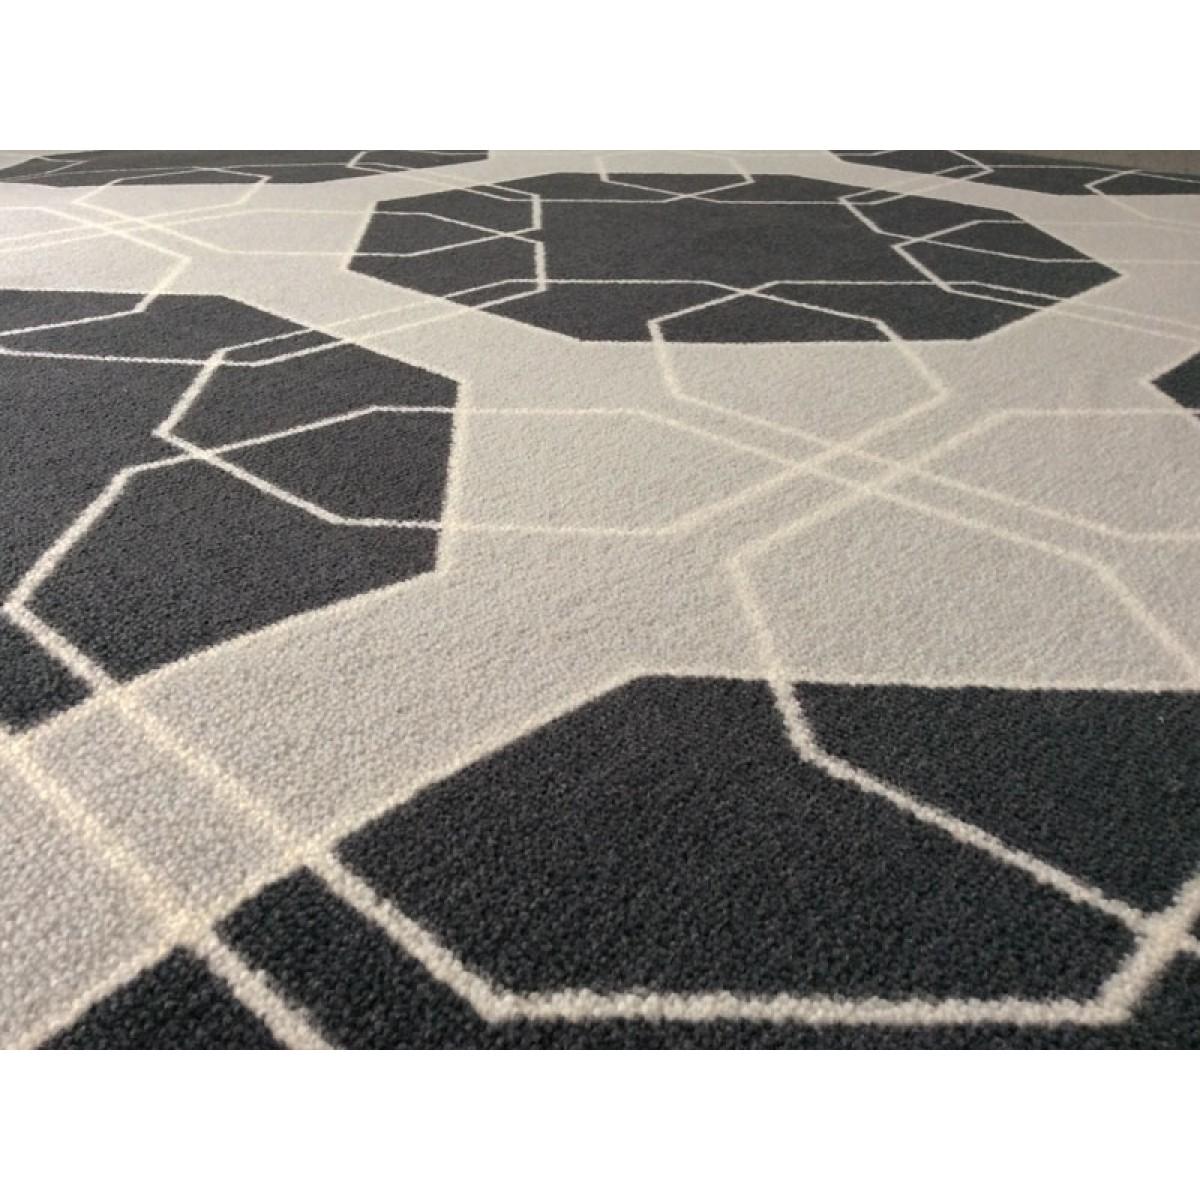 flat n octagon teppich 180 x 240 cm. Black Bedroom Furniture Sets. Home Design Ideas